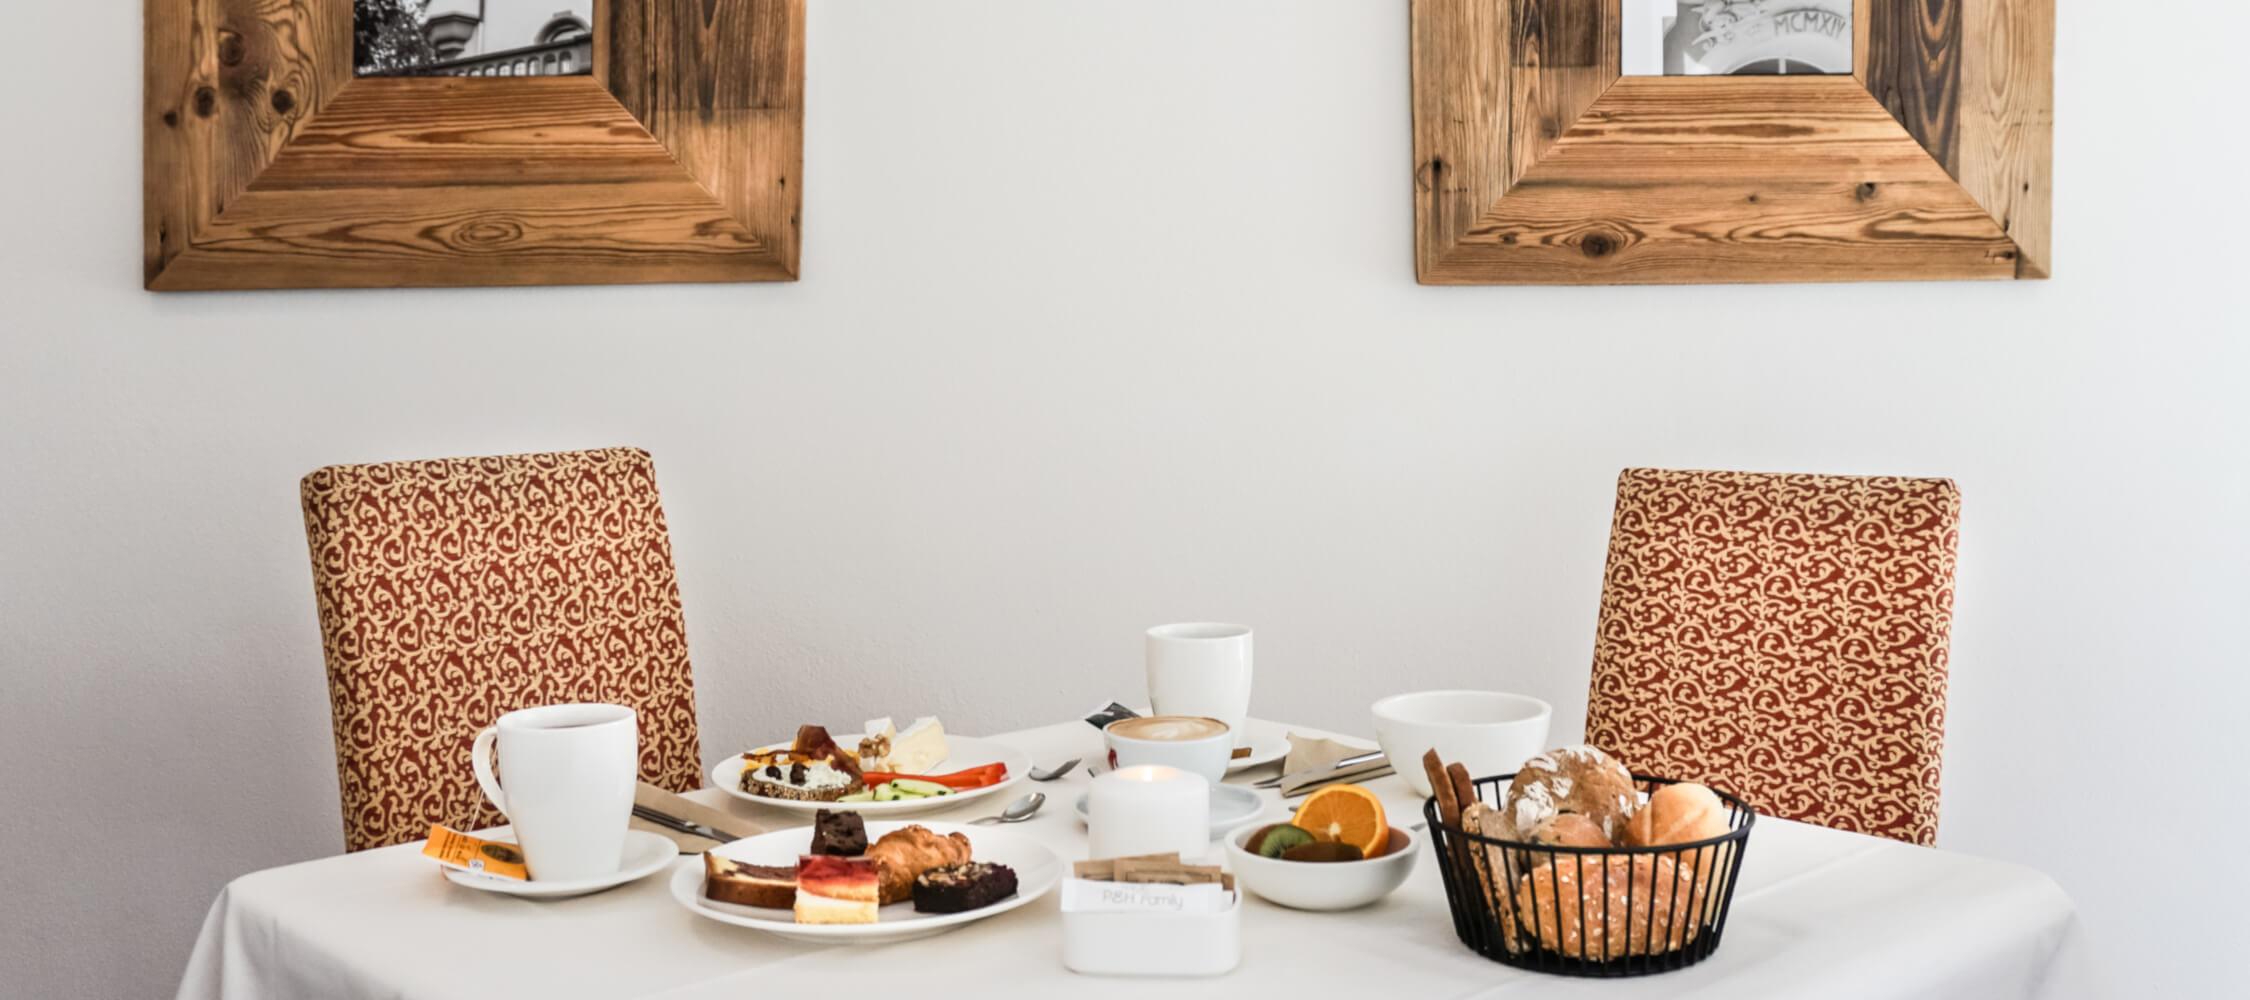 Hotel-Villa-Laurus-Merano-Bar-Lounge-Breakfast-Fruehstueck-Tisch-Anguane-06024-2250x1000